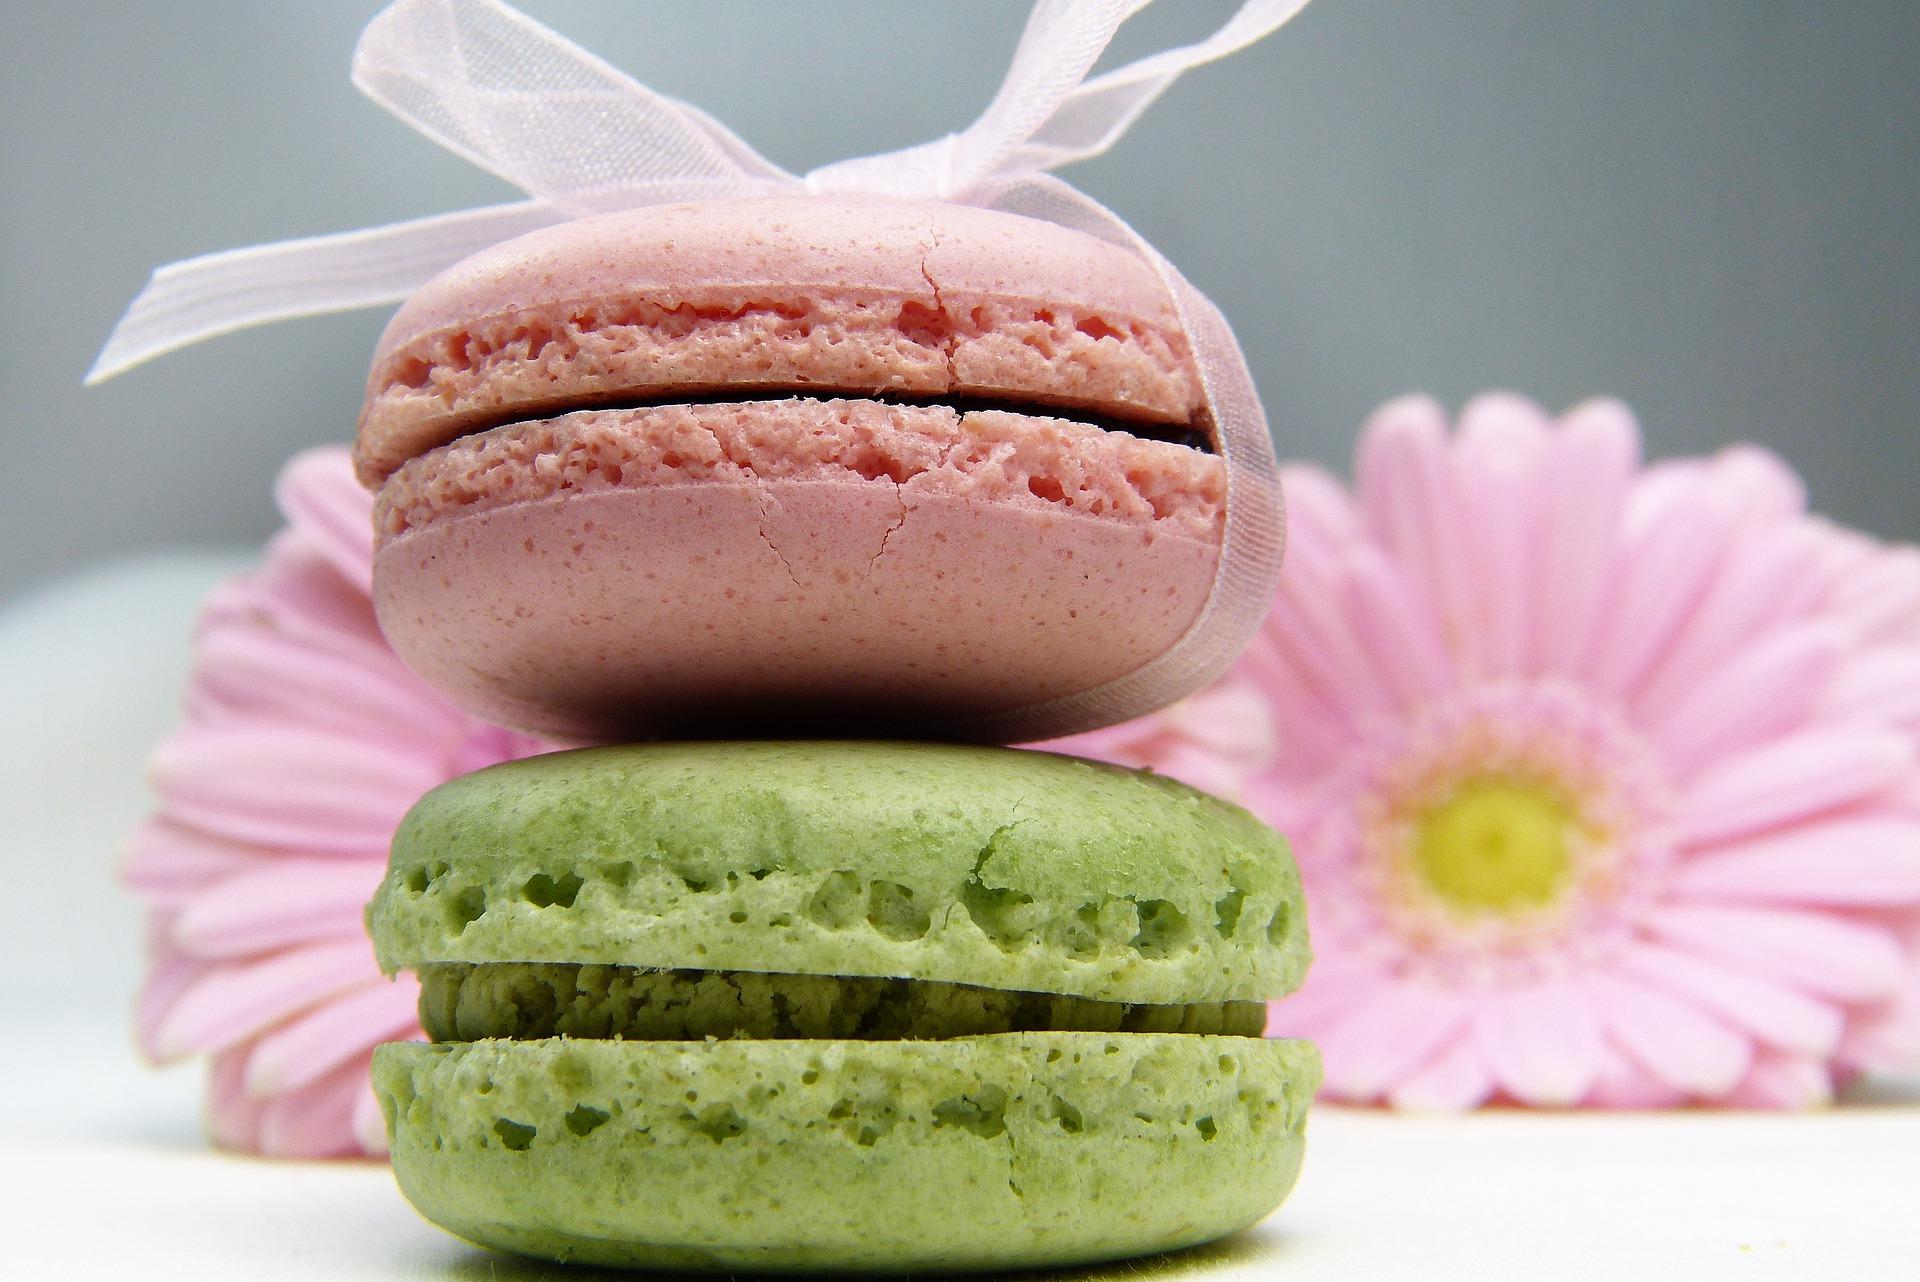 Solving the Macaron:Macaroon Riddle